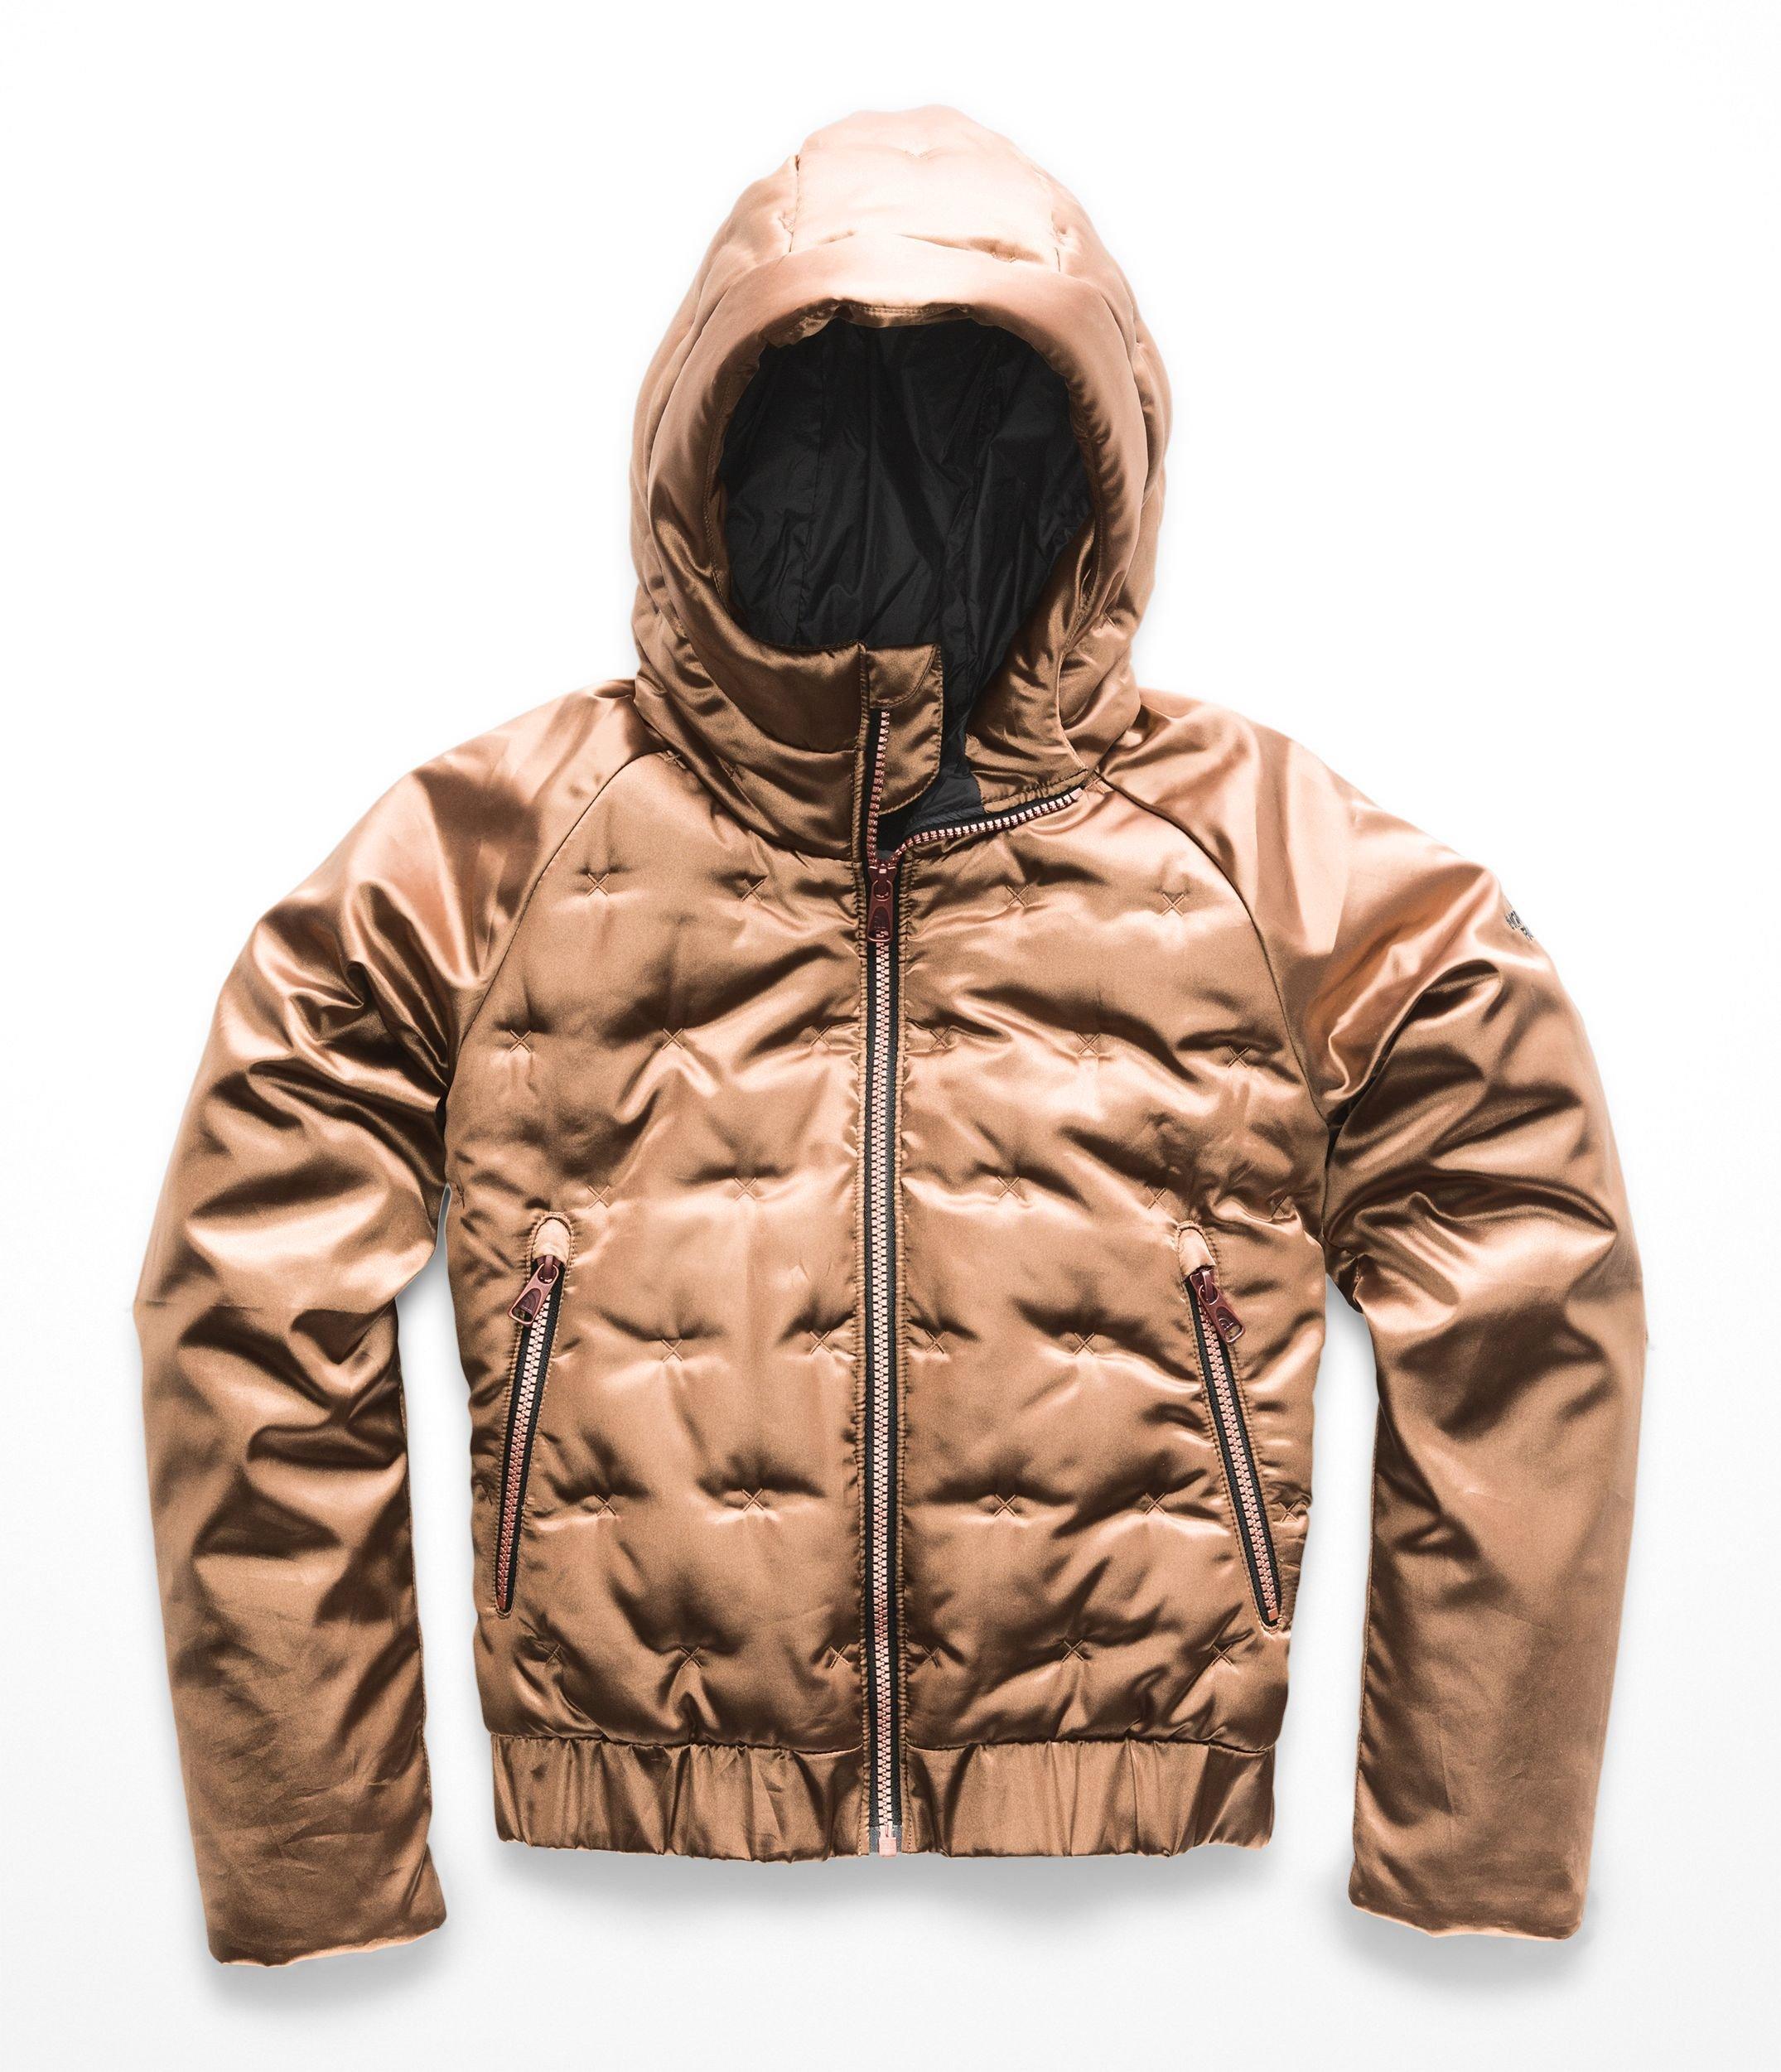 The North Face Girl's Mashup Full Zip Hoodie - Metallic Copper - S